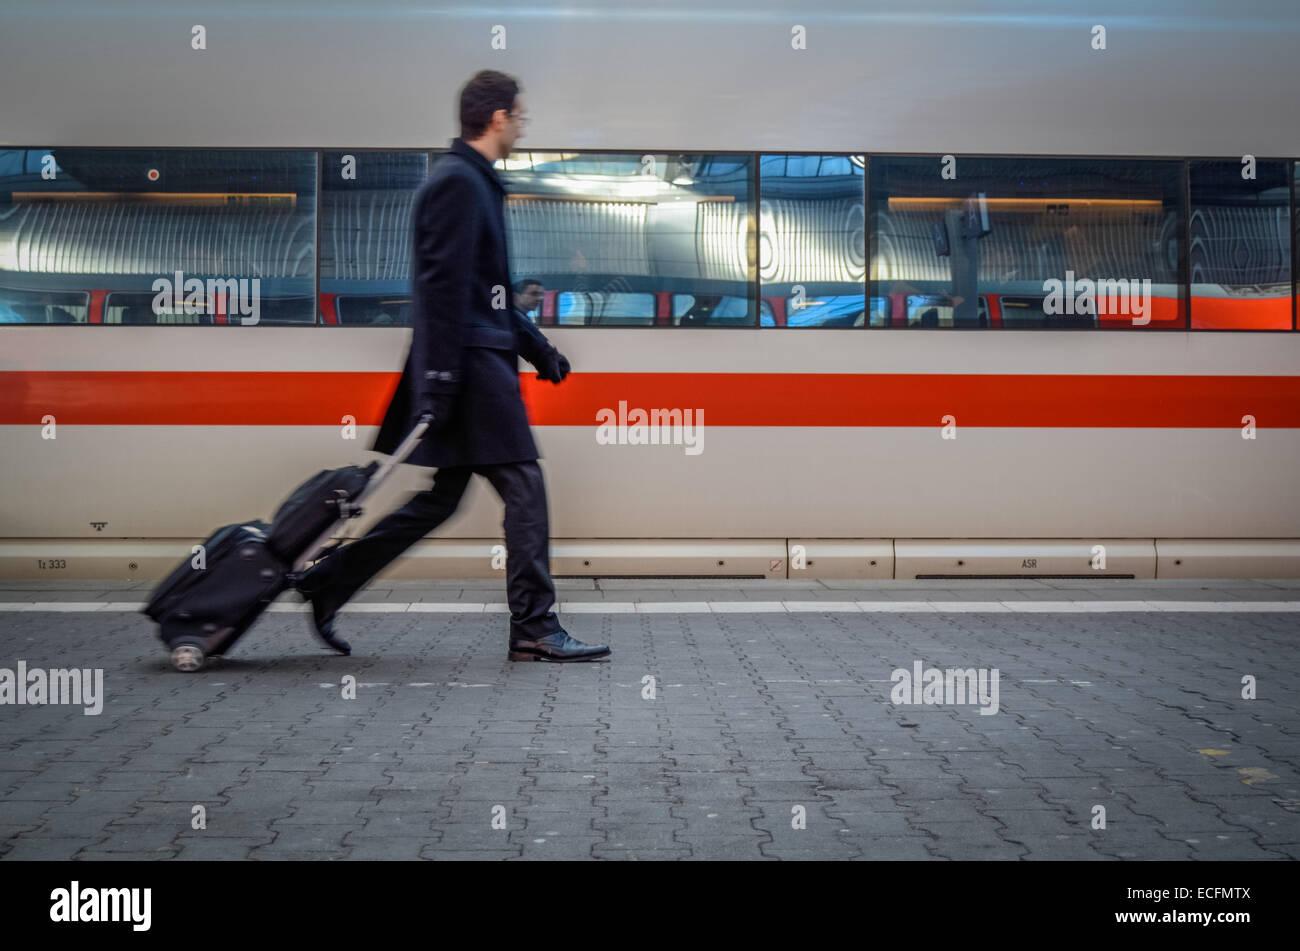 Man Rushing To Catch A Train - Stock Image